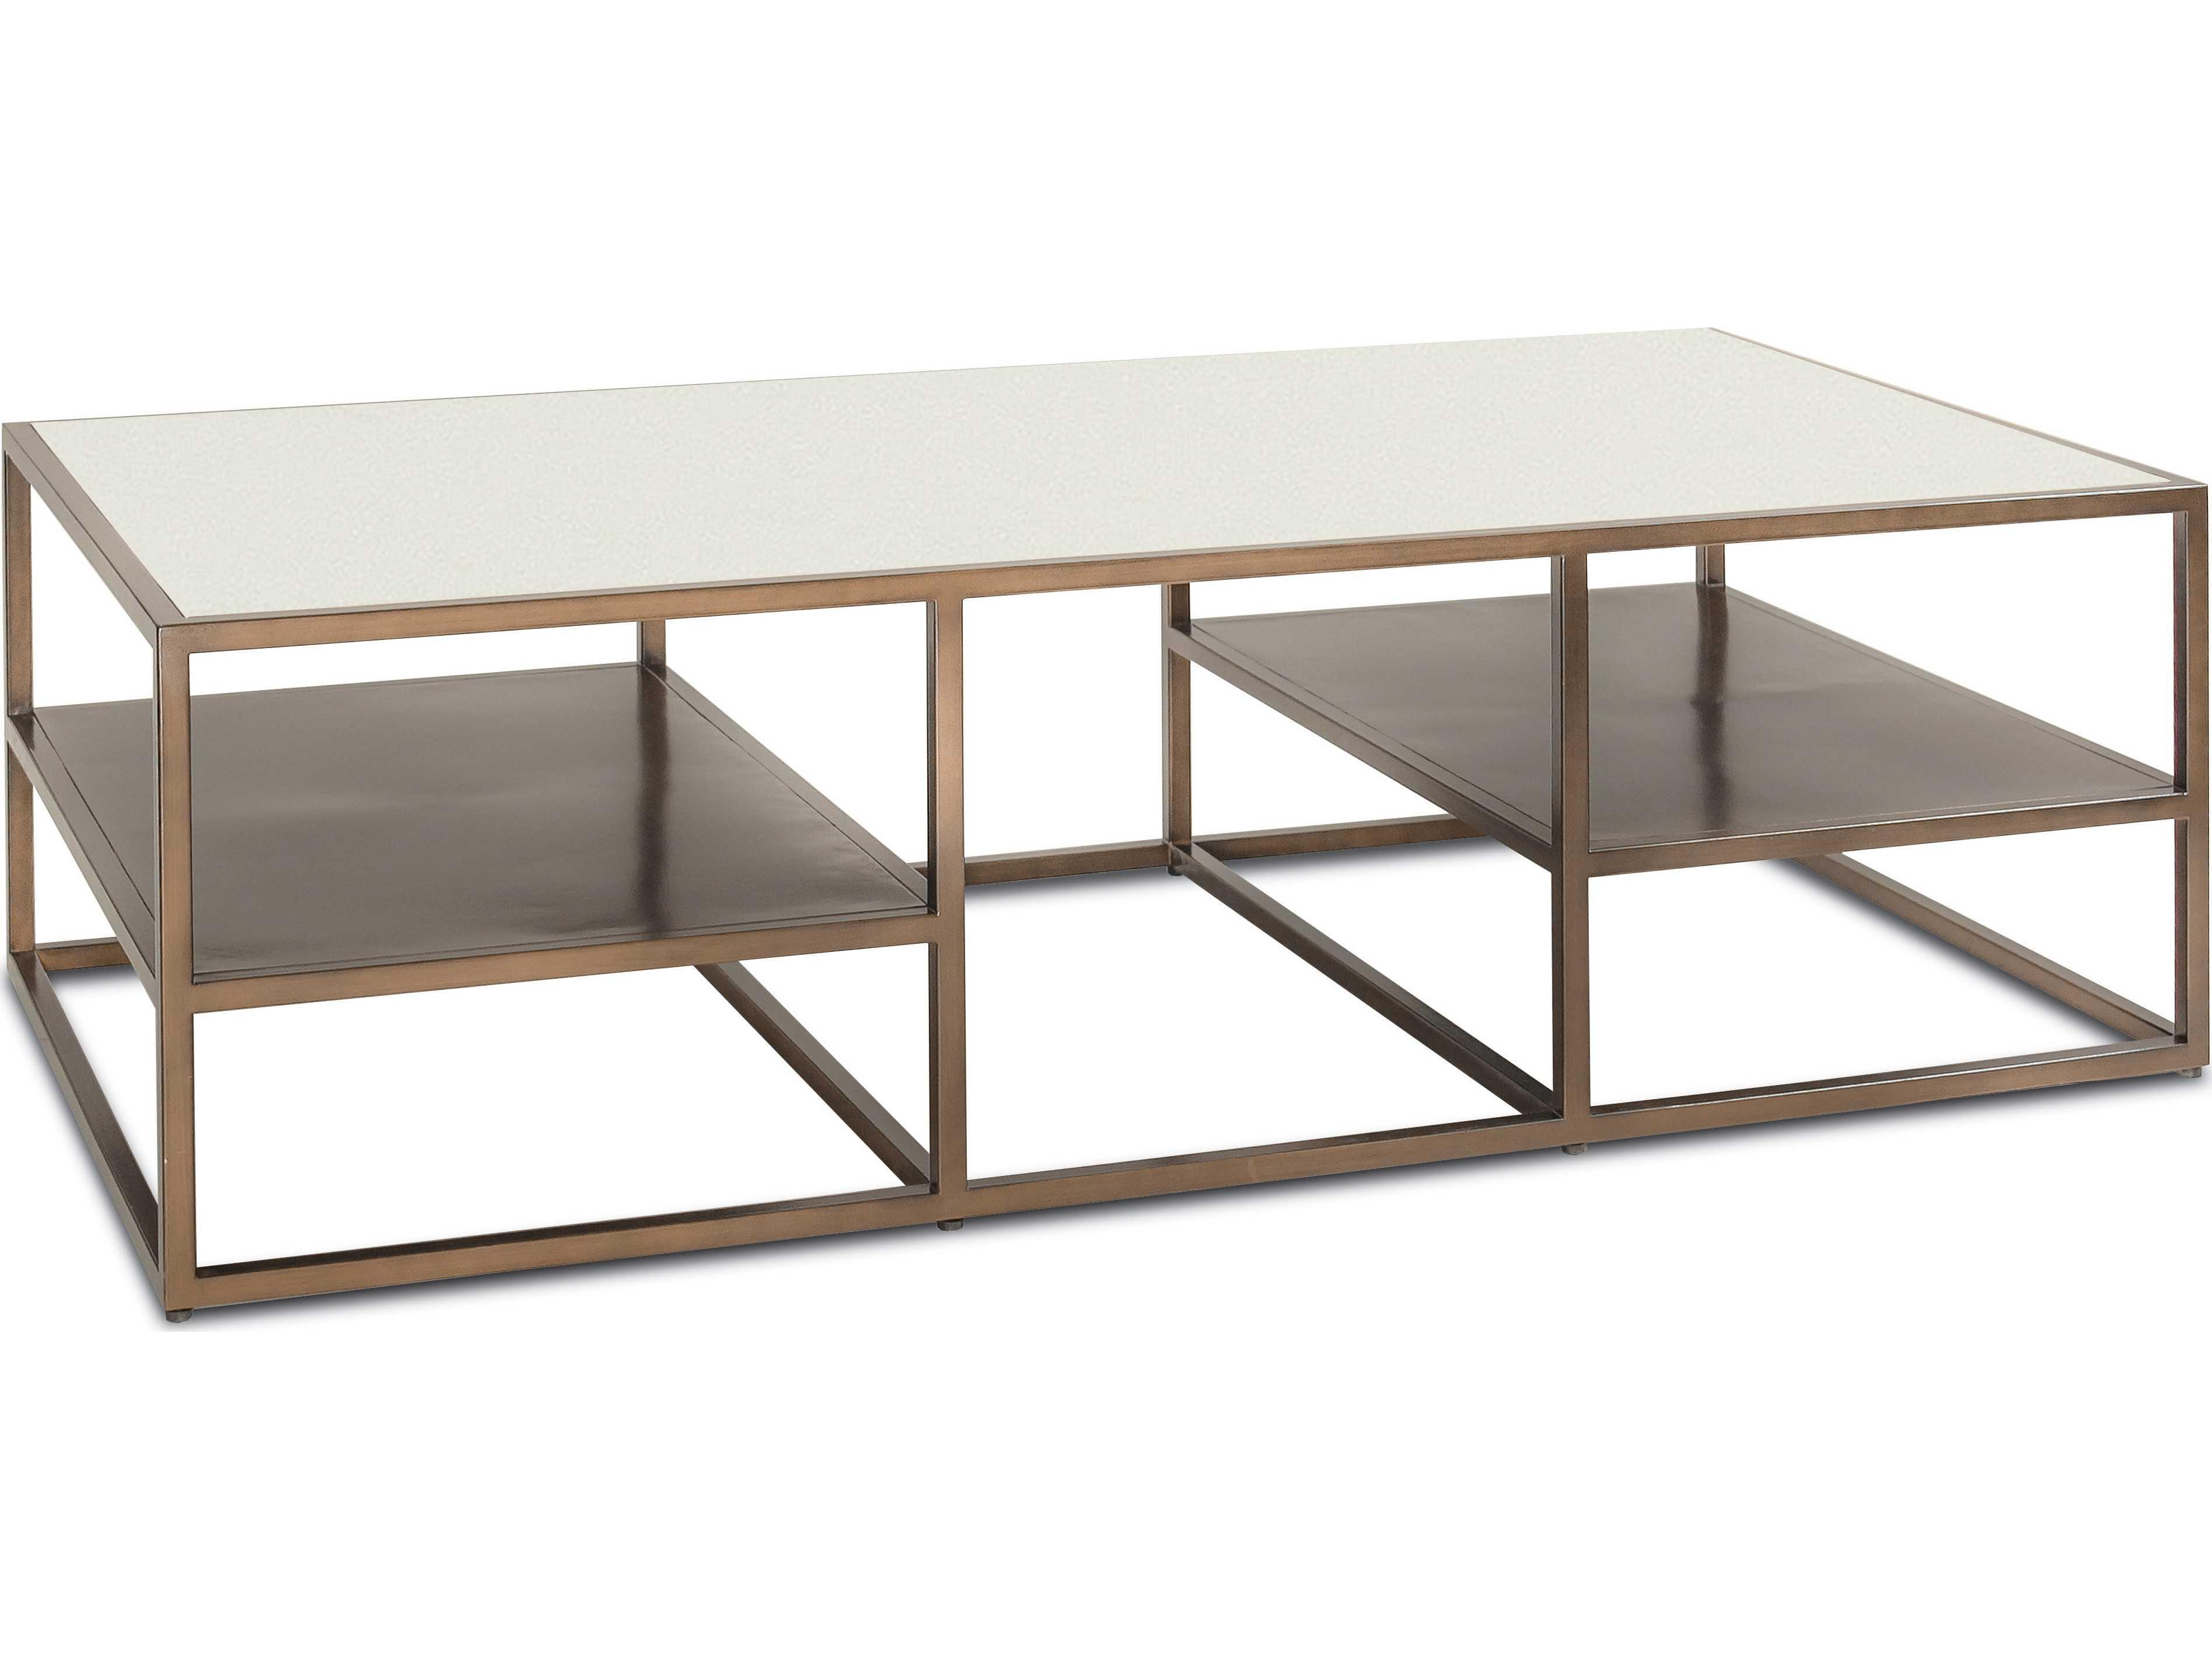 Ikea Sleeper Sofa Home & Interior Design